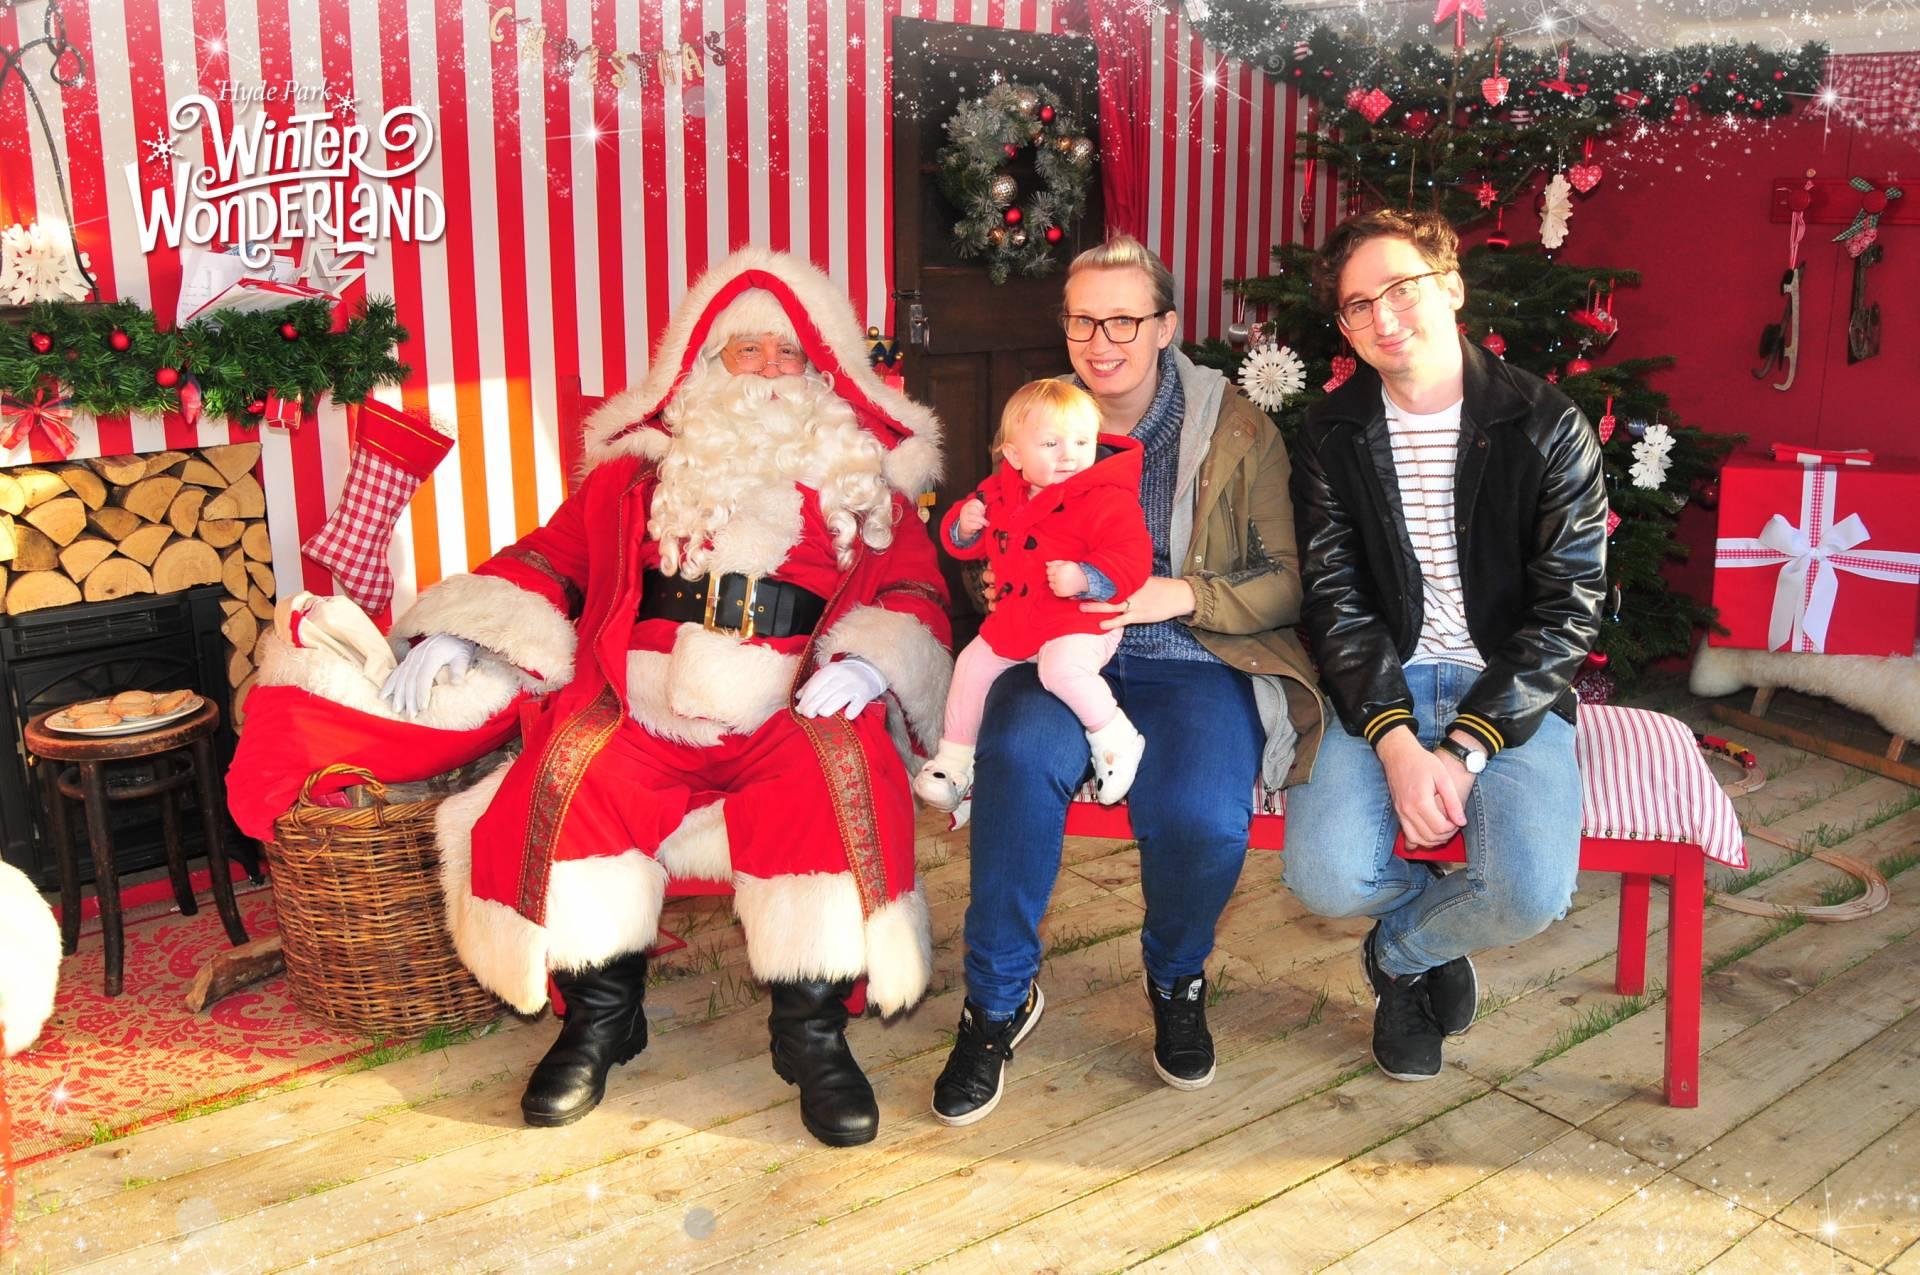 us and santa at winterwonderland